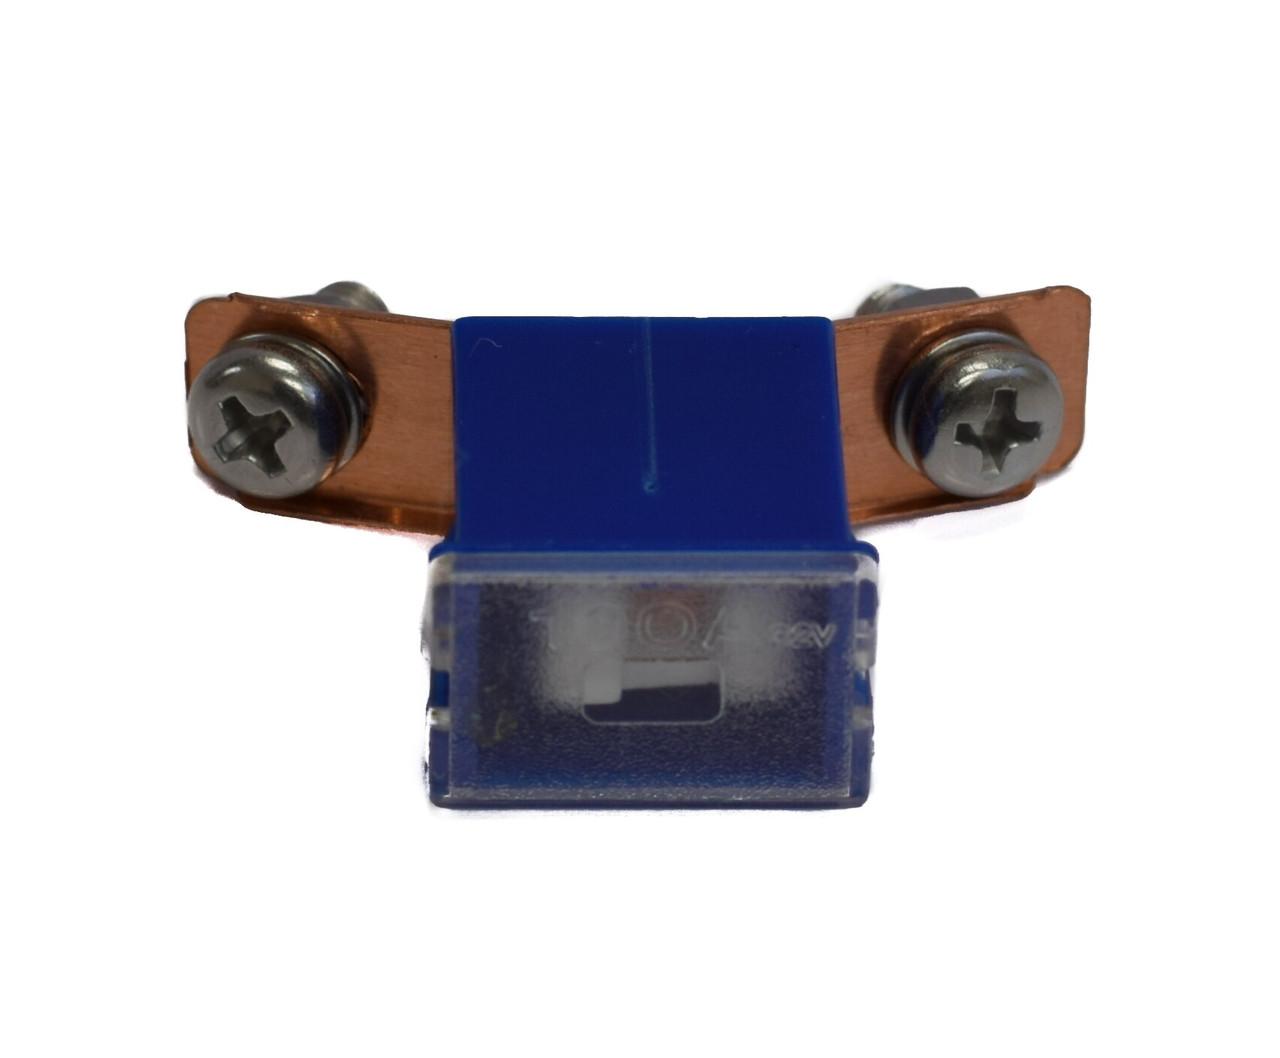 Raion Power RBC7 100A Fuse Includes Nuts & Bolts For APC SmartUPS SU1400X145